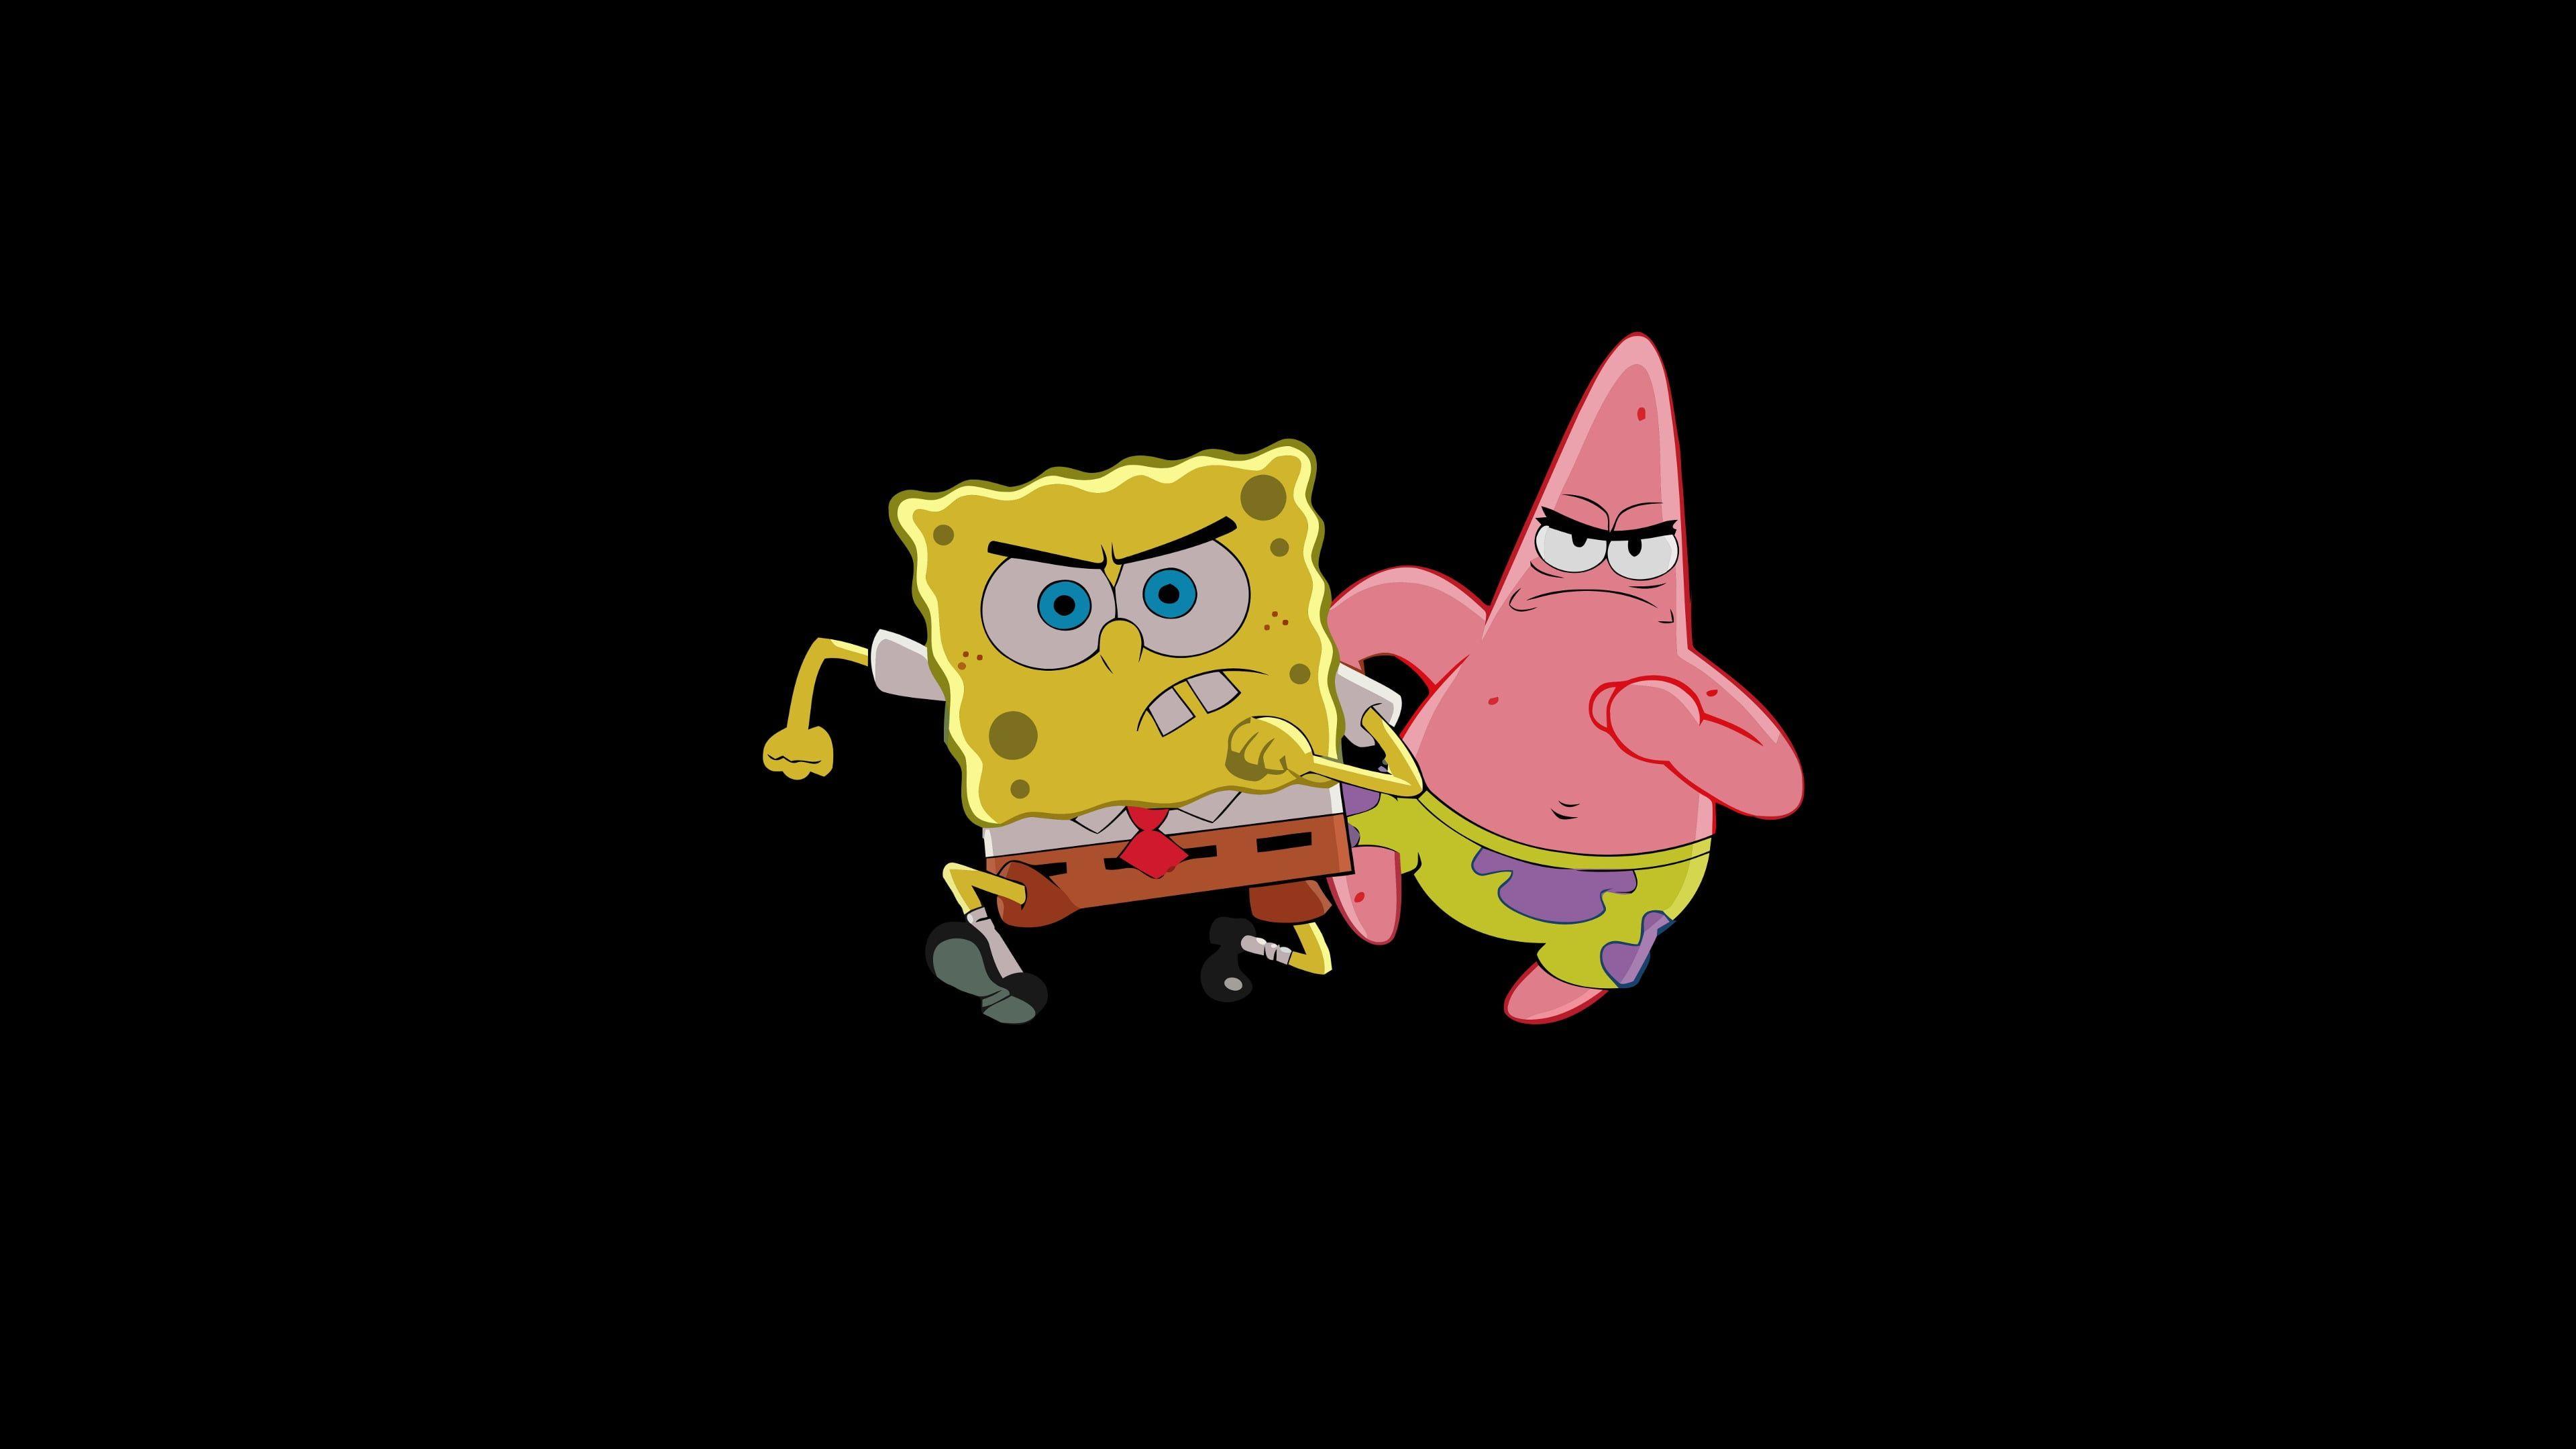 HD wallpaper: Spongebob Squarepants and Patrick illustration, simple, simple background